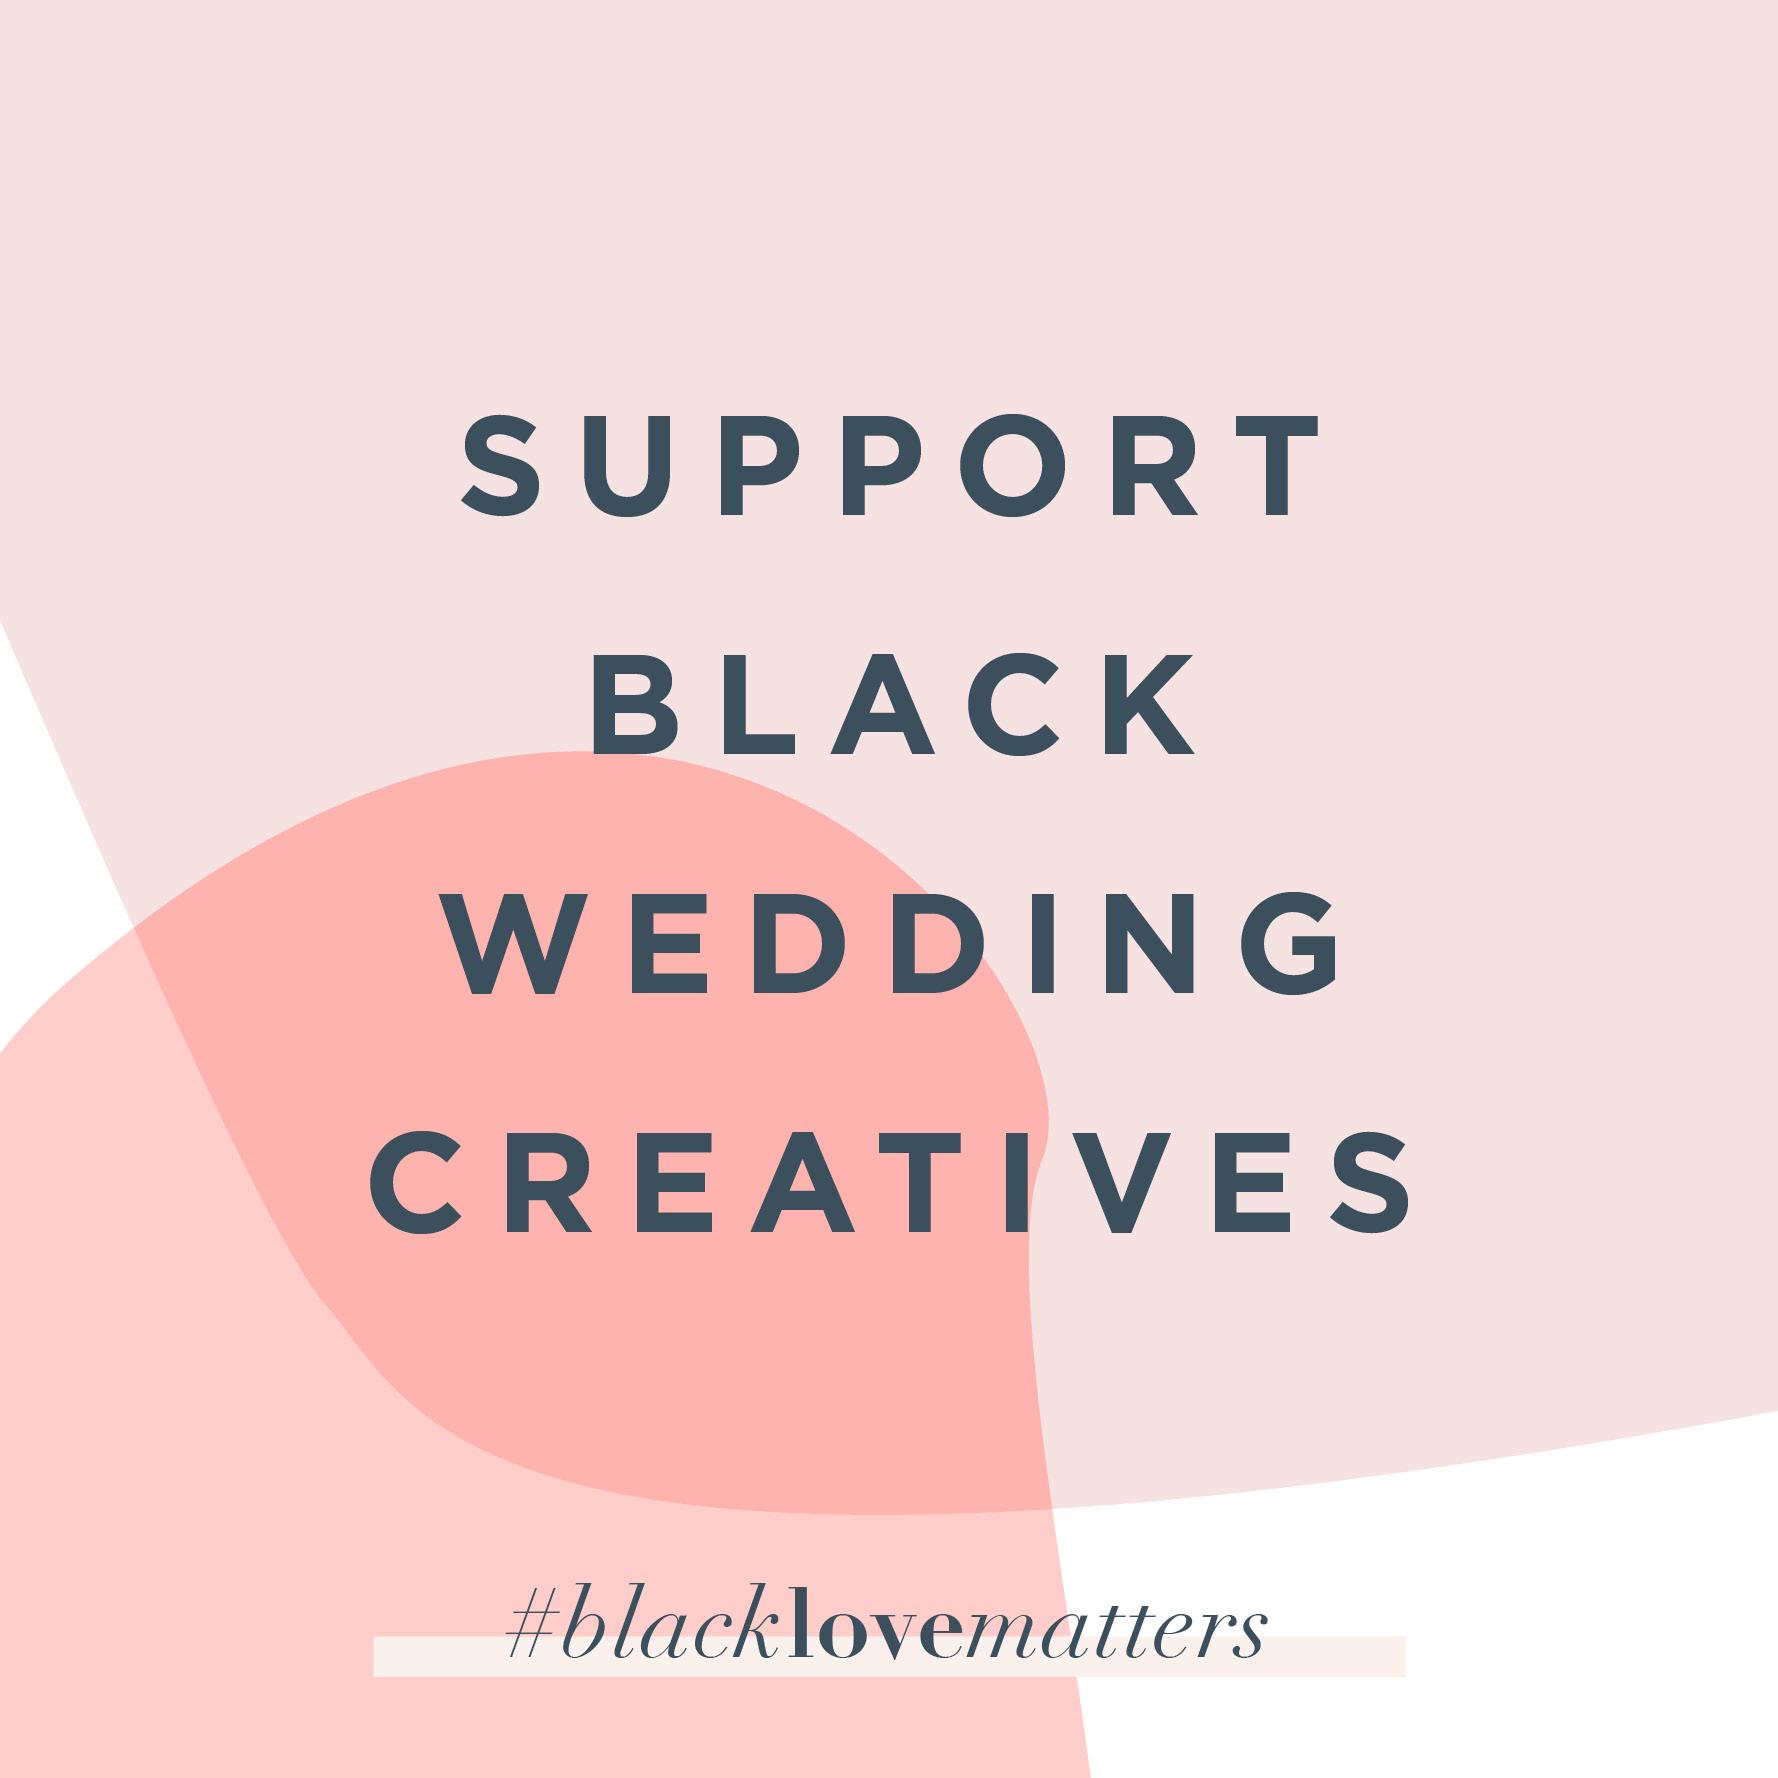 Support Black Wedding Creatives